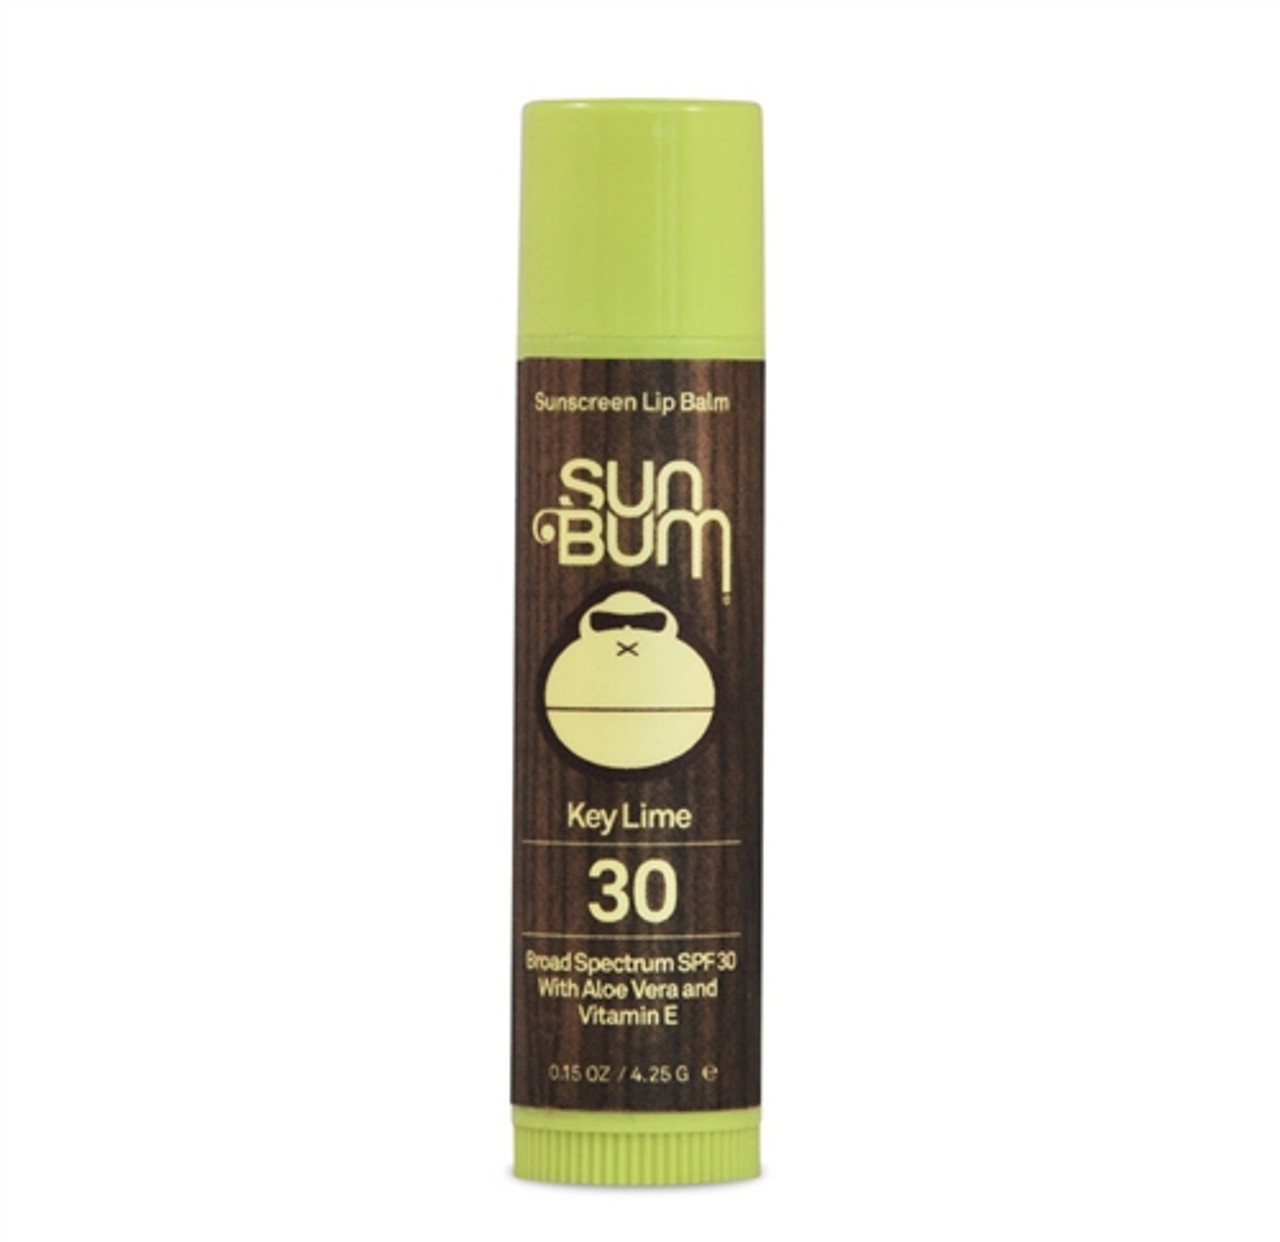 Sun Bum Lip Balm SPF 30 - Key Lime